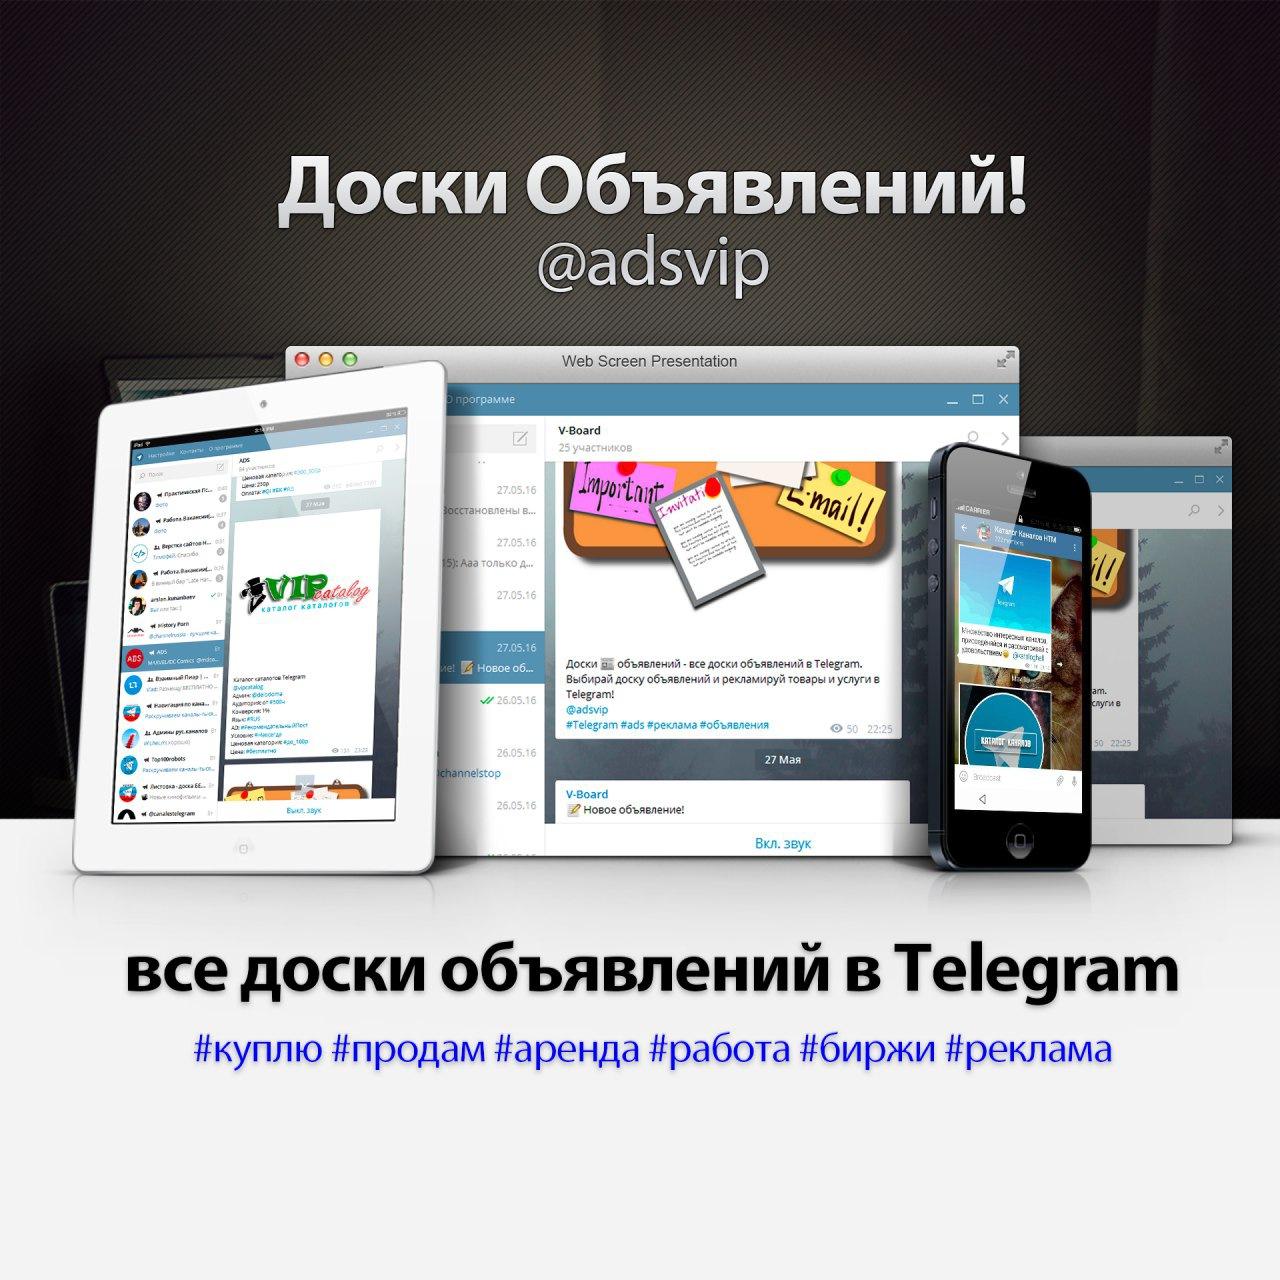 fd7e251beae3  adsvip - Статистика канала Доски 📰 объявлений • каталог. Telegram  Analytics